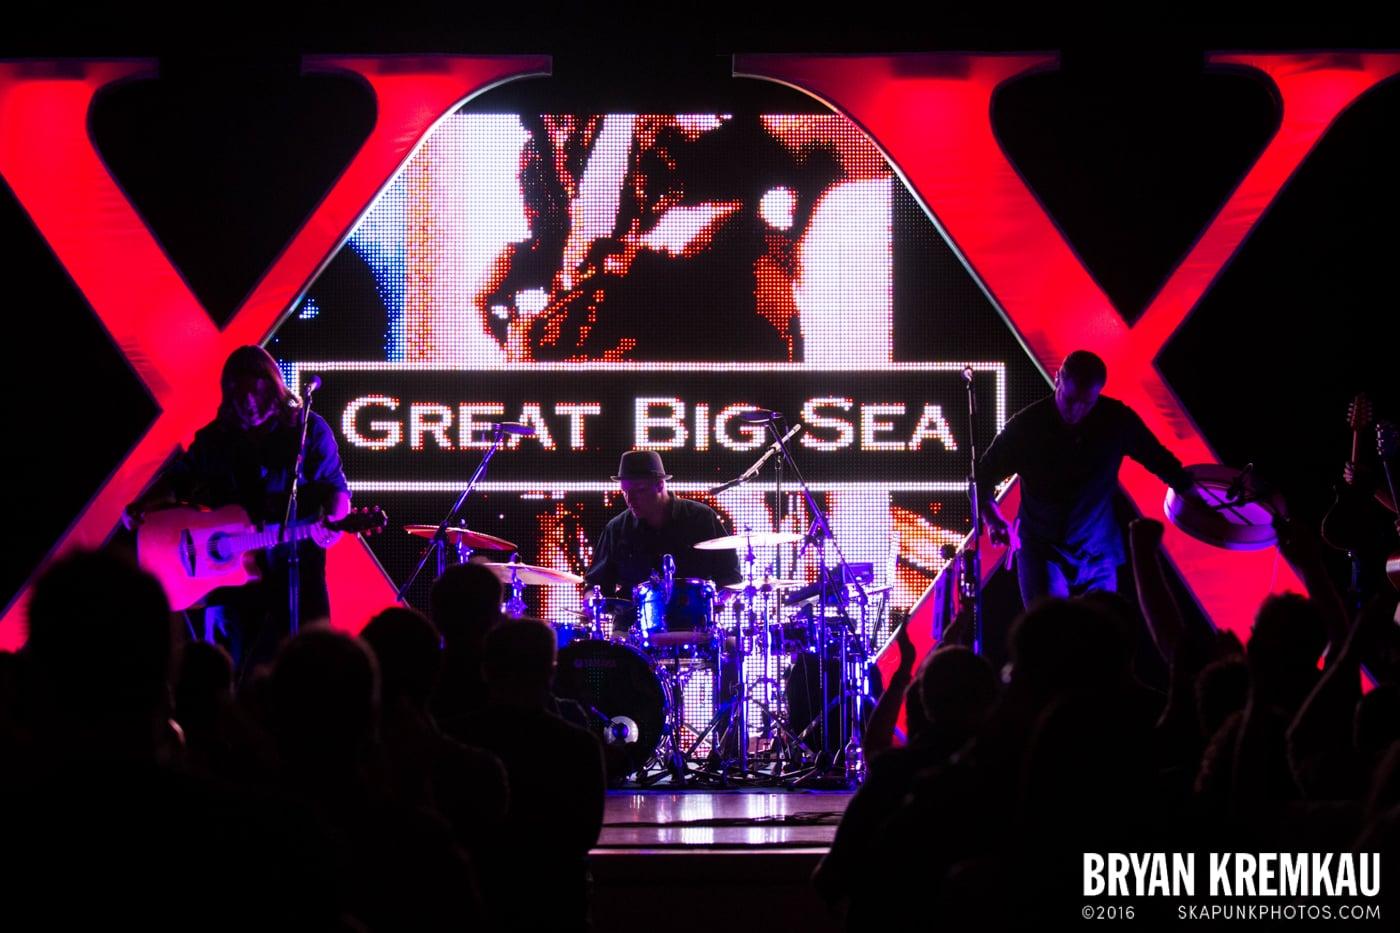 Great Big Sea @ The Town Hall, NYC - 4.19.13 (11)